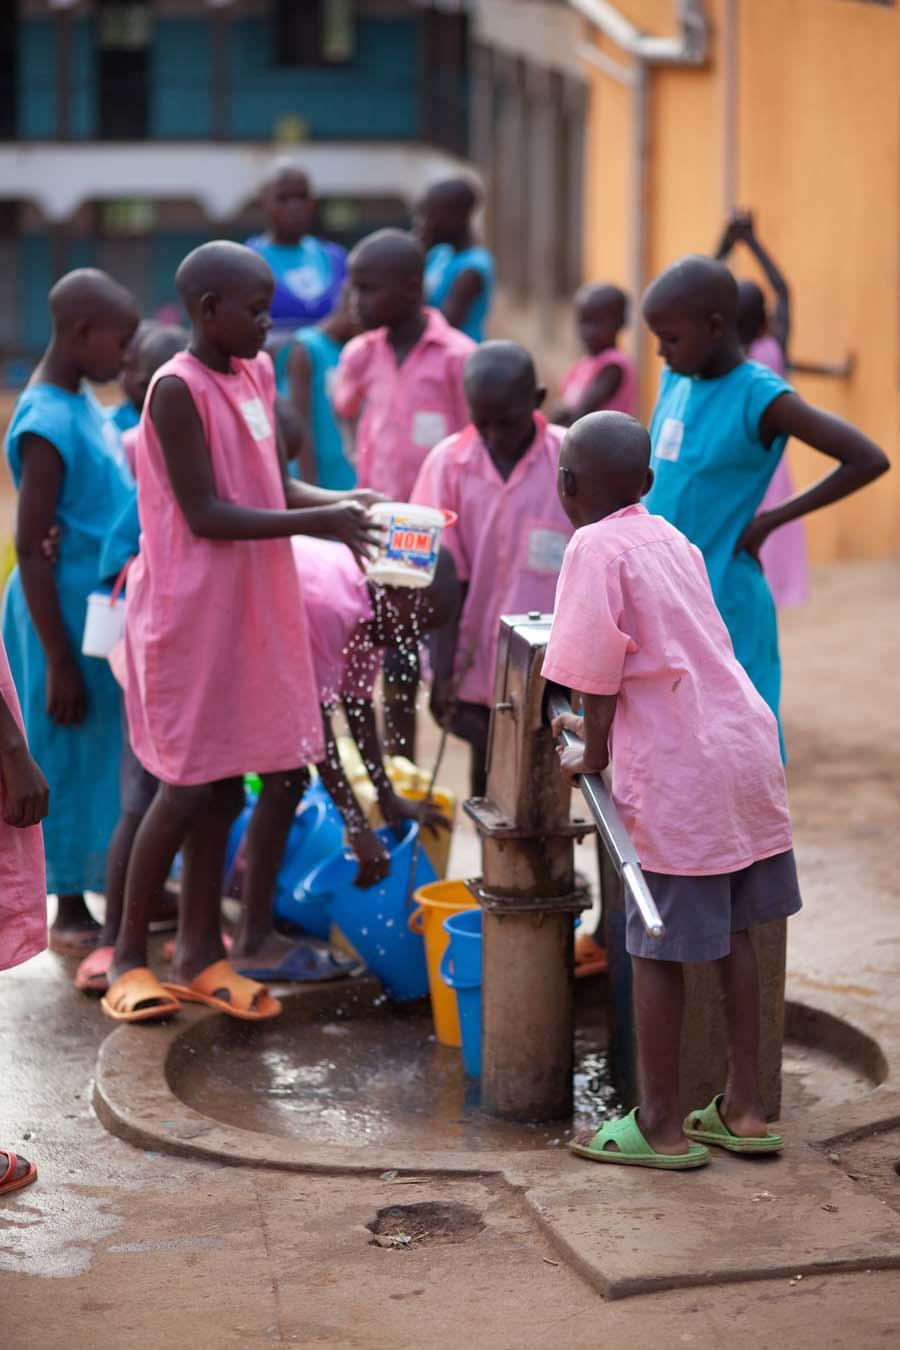 jessicadavisphotography.com | Jessica Davis Photography | Portrait Work in Uganda| Travel Photographer | World Event Photographs 4 (7).jpg